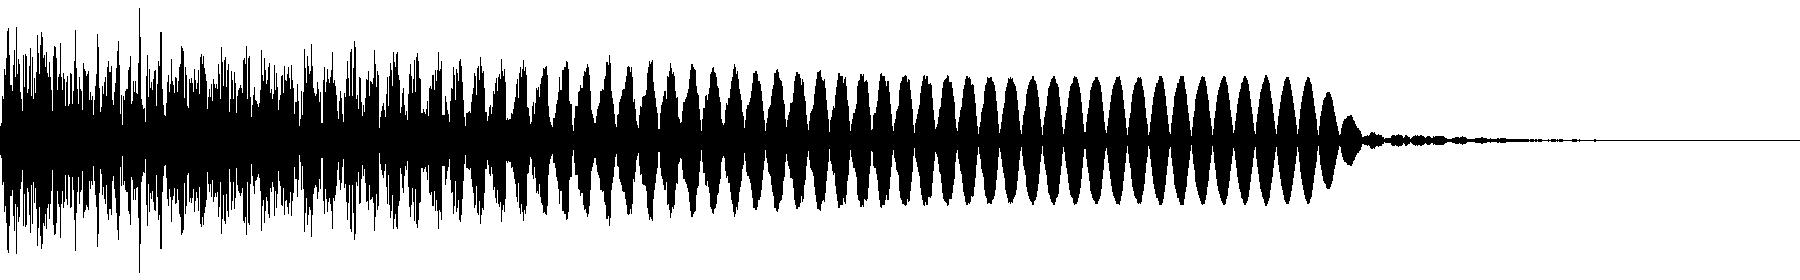 vedh bass cut 068 g